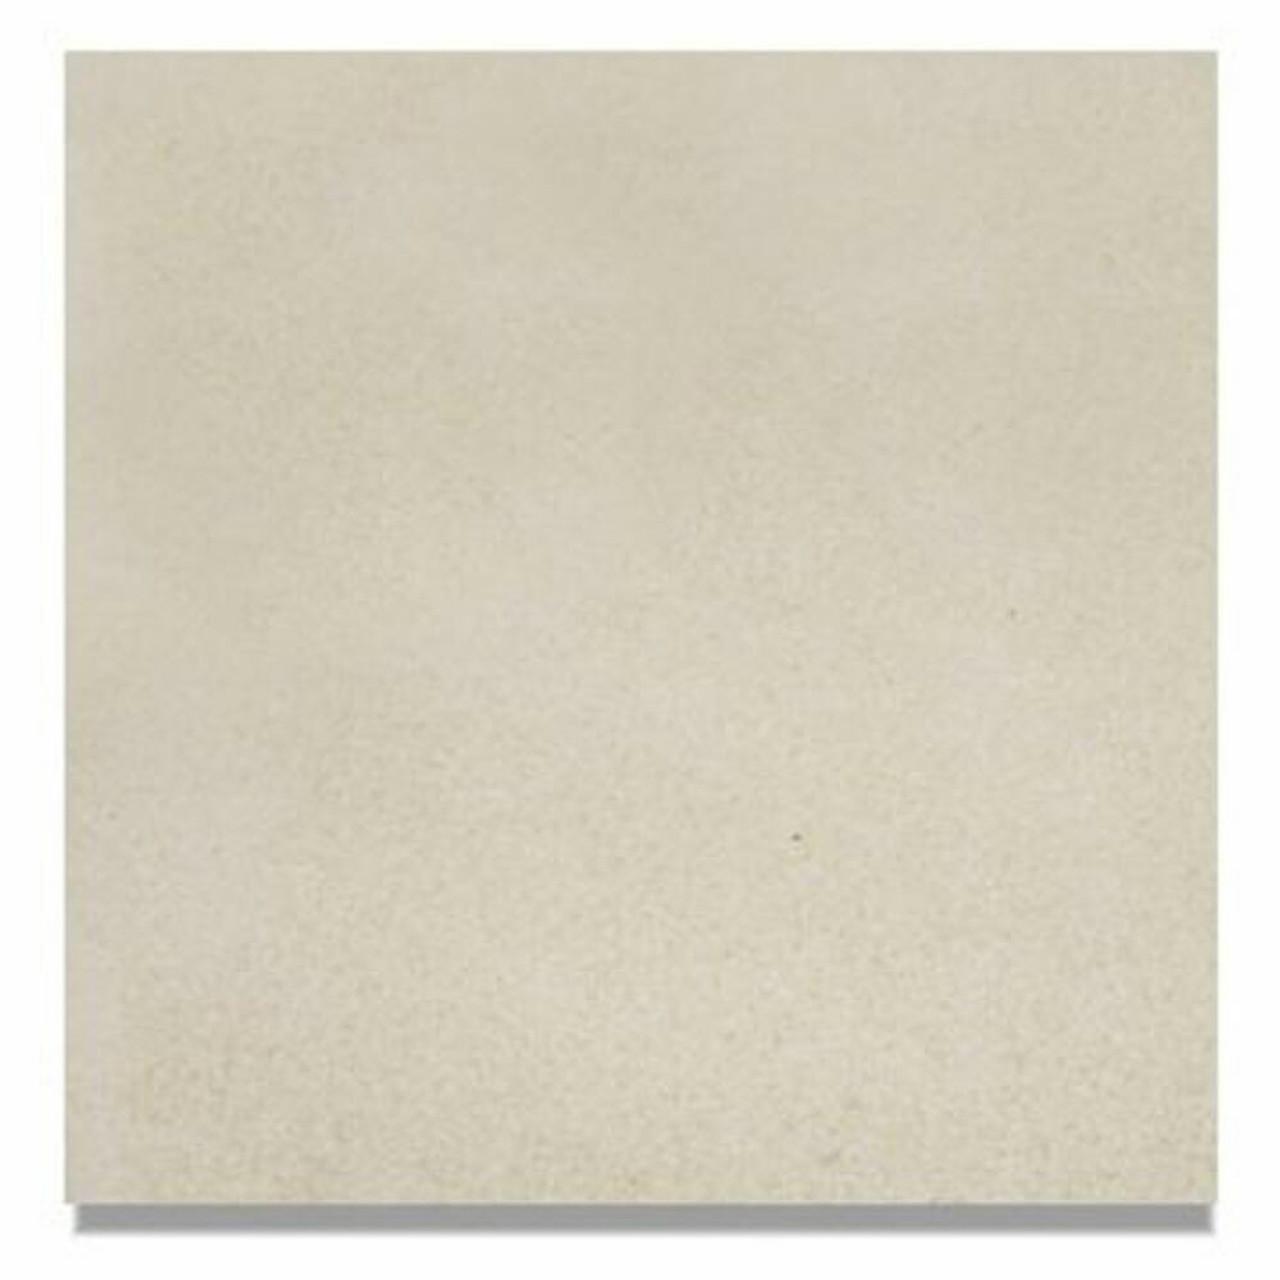 "High Alumina 18"" x 18"" Square Kiln Shelf - 3/4"" thick"